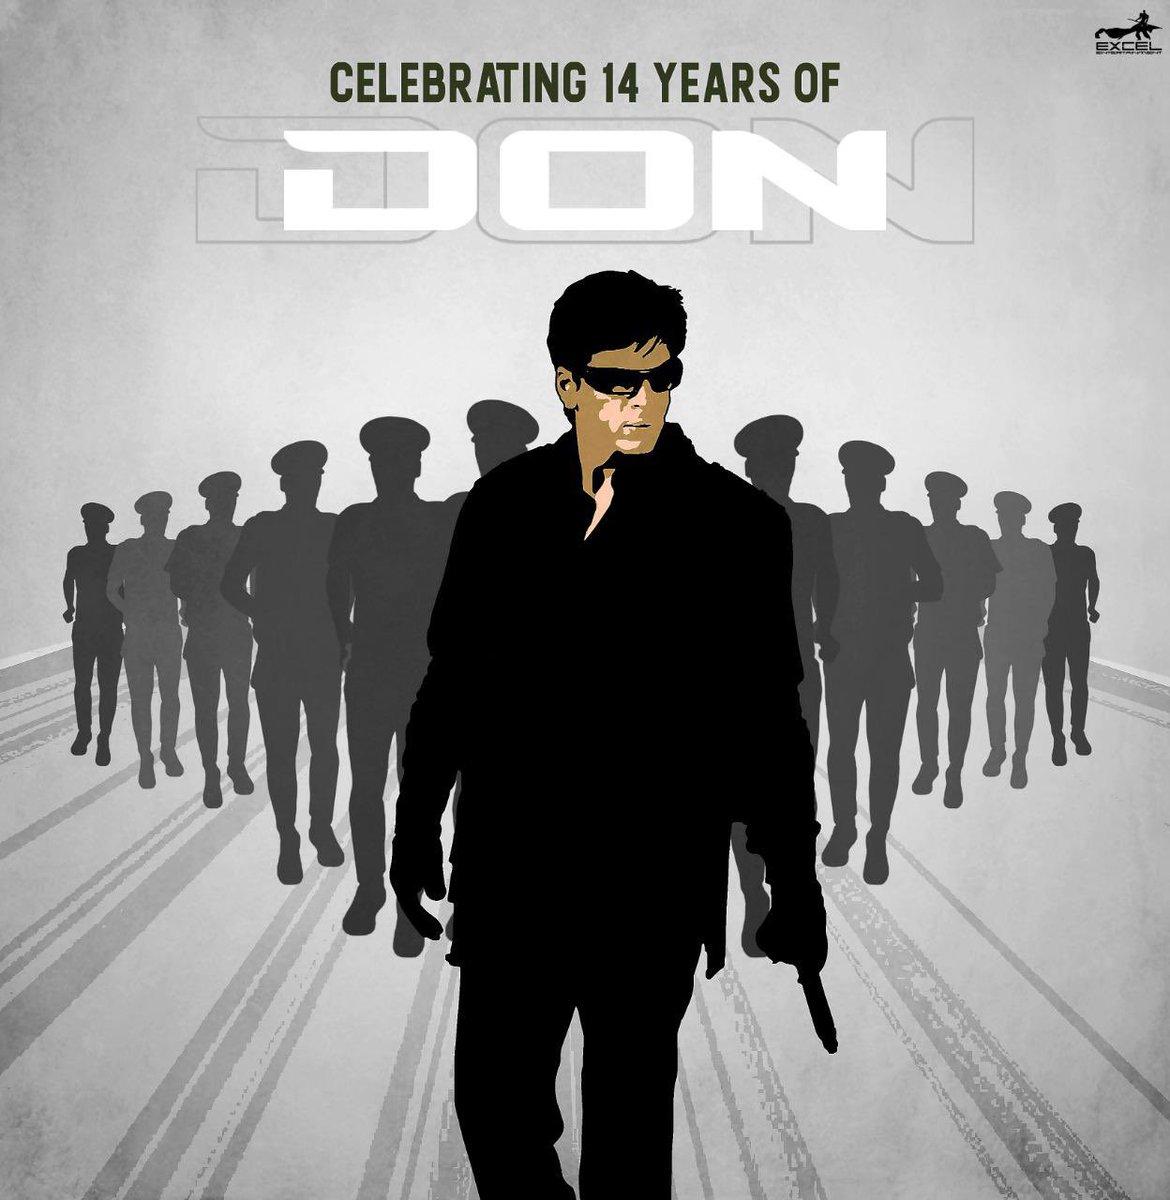 Looking back at the action, thrill & chase that began 14 years ago. Here's celebrating #14YearsOfDon  @iamsrk @priyankachopra @bomanirani @rampalarjun #KareenaKapoorKhan @ishakonnects @FarOutAkhtar @ritesh_sid @Javedakhtarjadu @ShankarEhsanLoy #KUMohanan  #Don